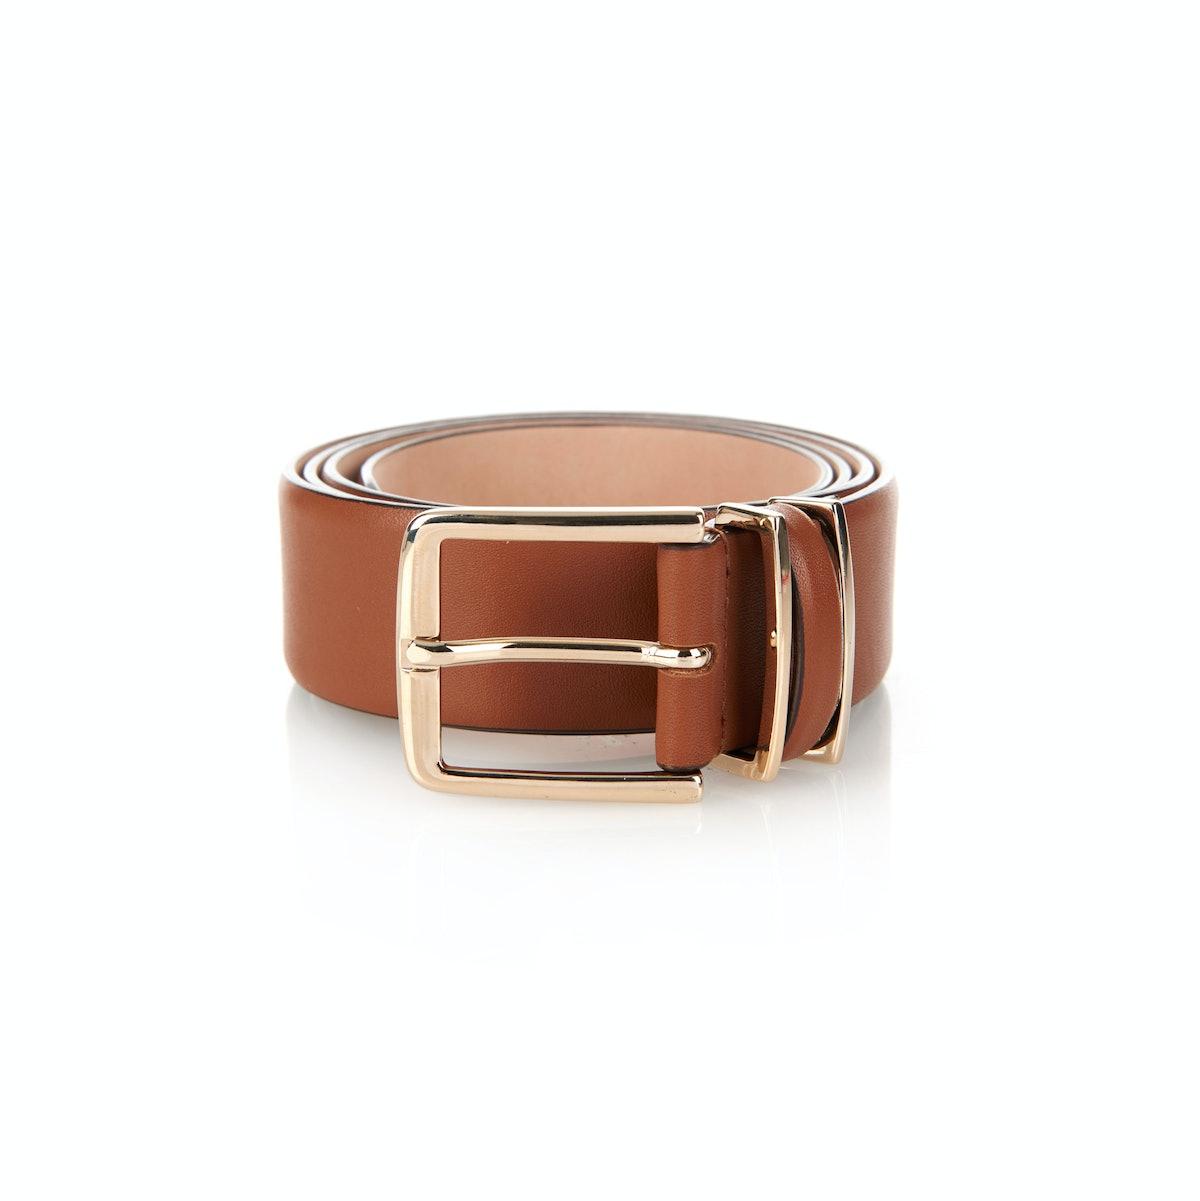 Max Mara Alare leather belt